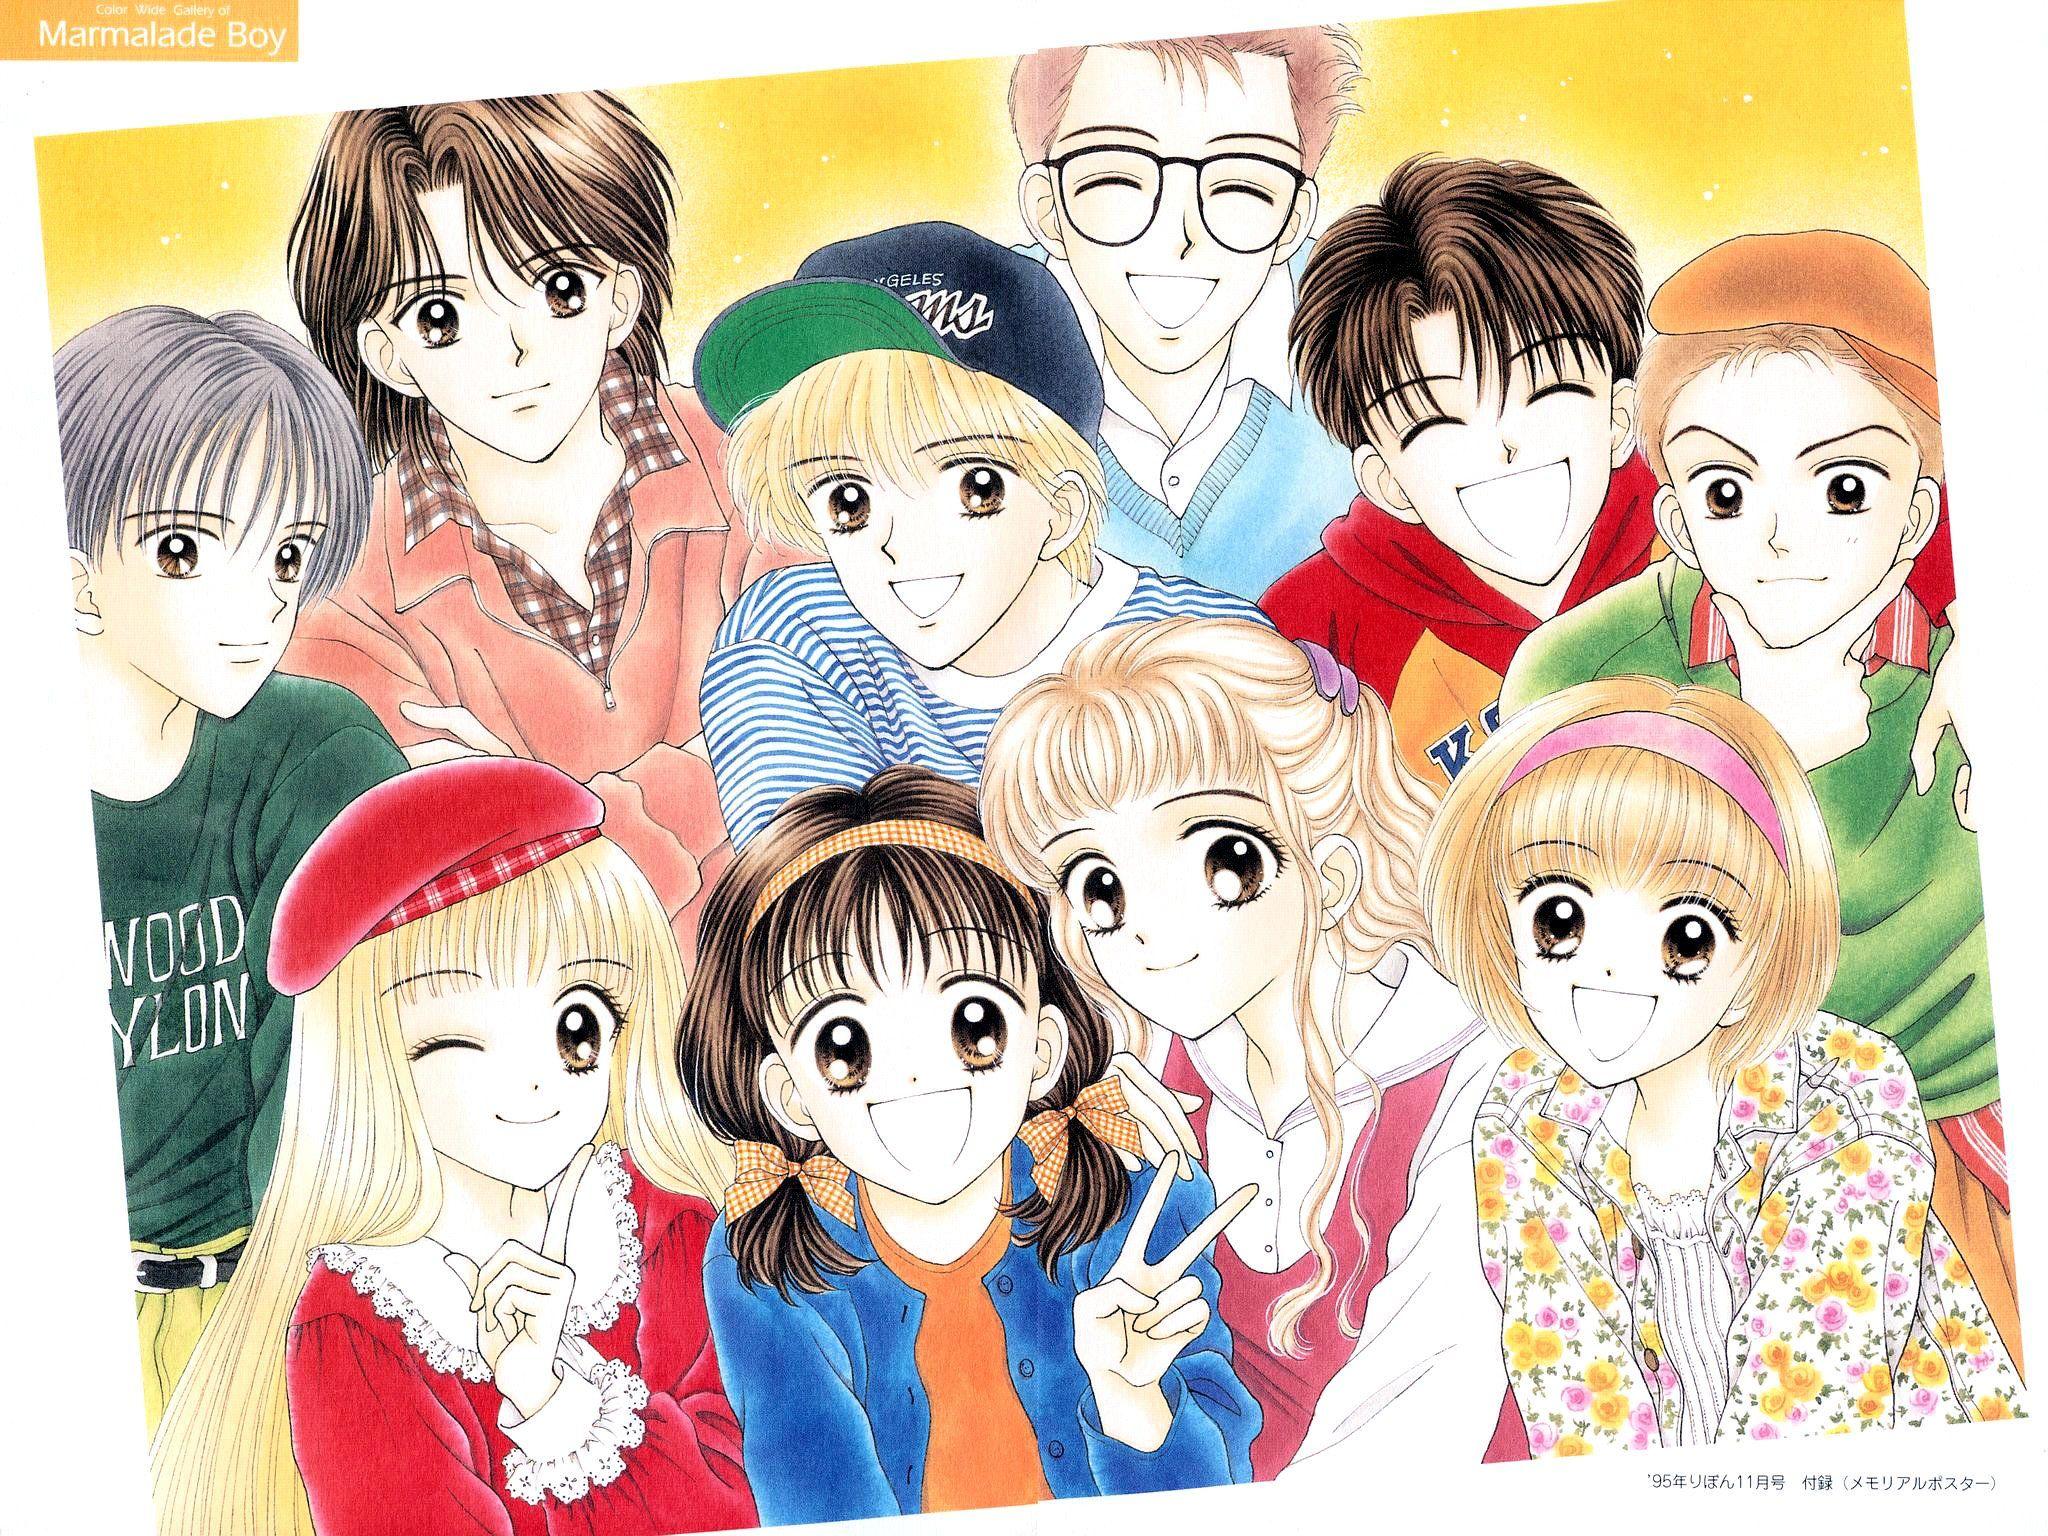 Marmalade Boy Anime Pinterest Manga, Marmalade e Boys